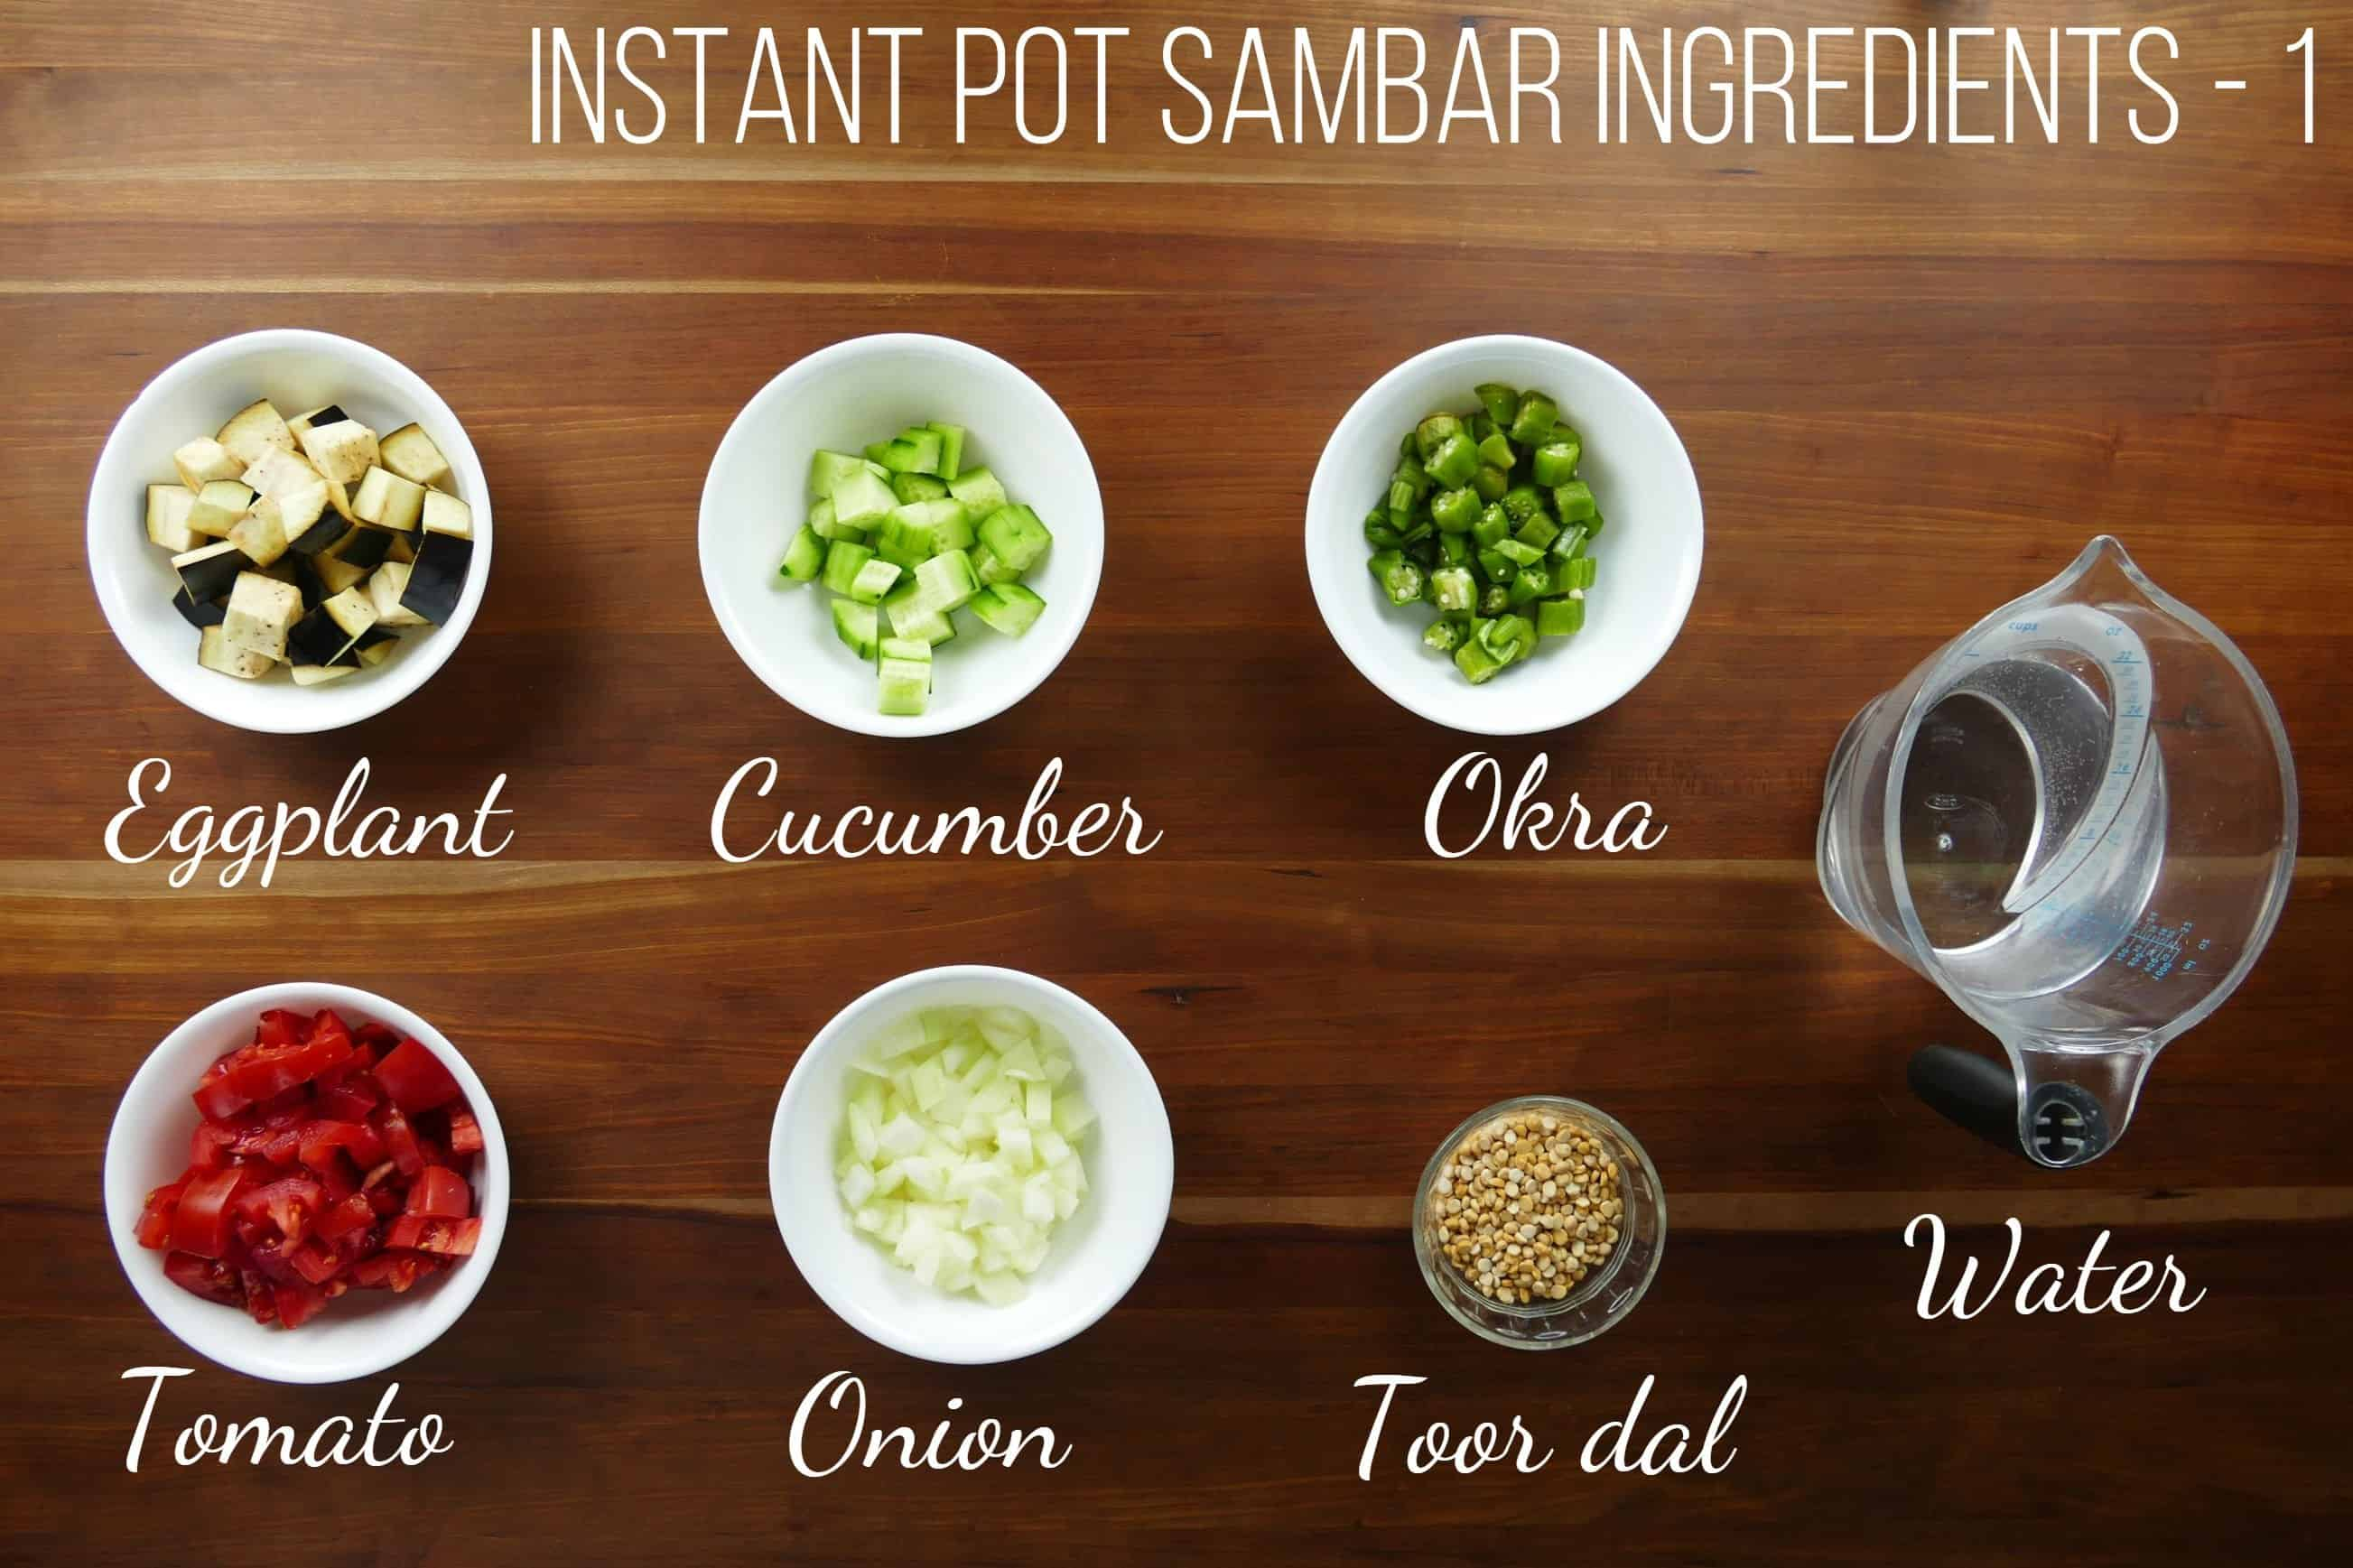 Instant Pot Sambar Ingredients 1 - eggplant, cucumber, okra, water, tomato, onion, toor dal